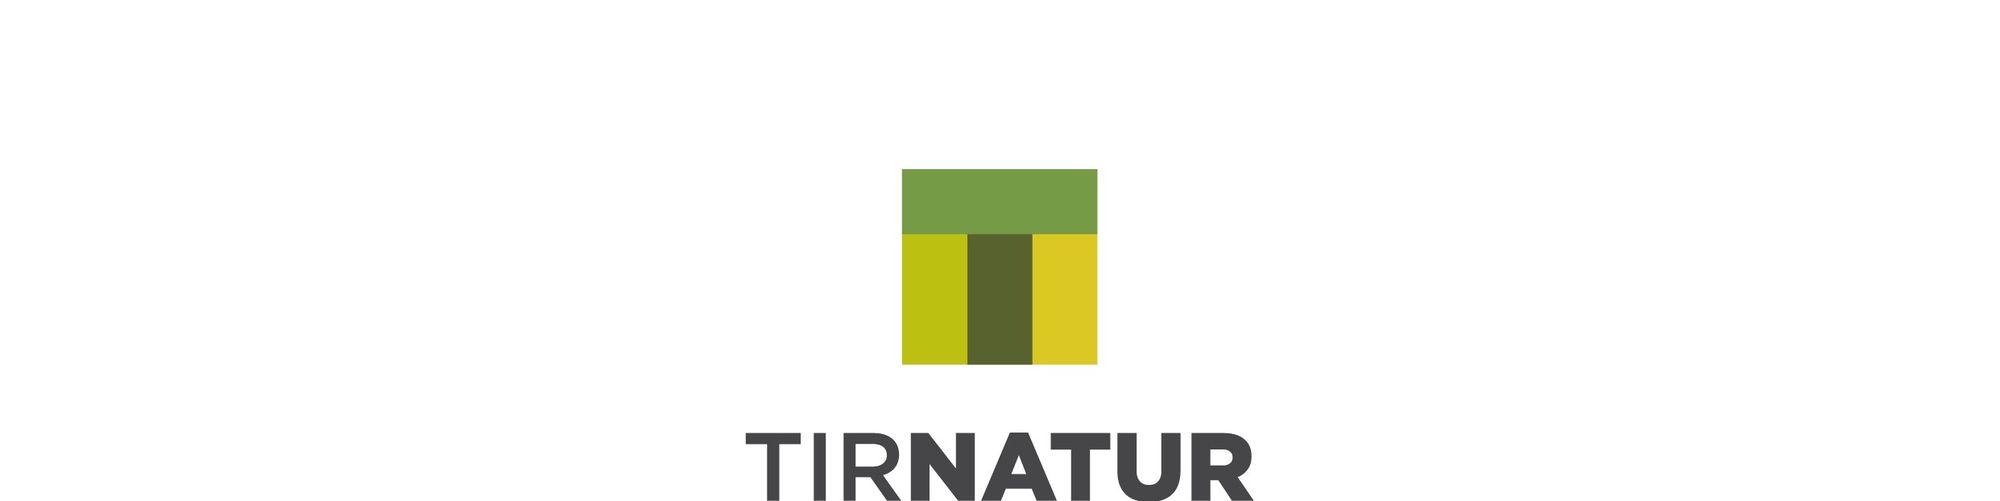 TirNatur